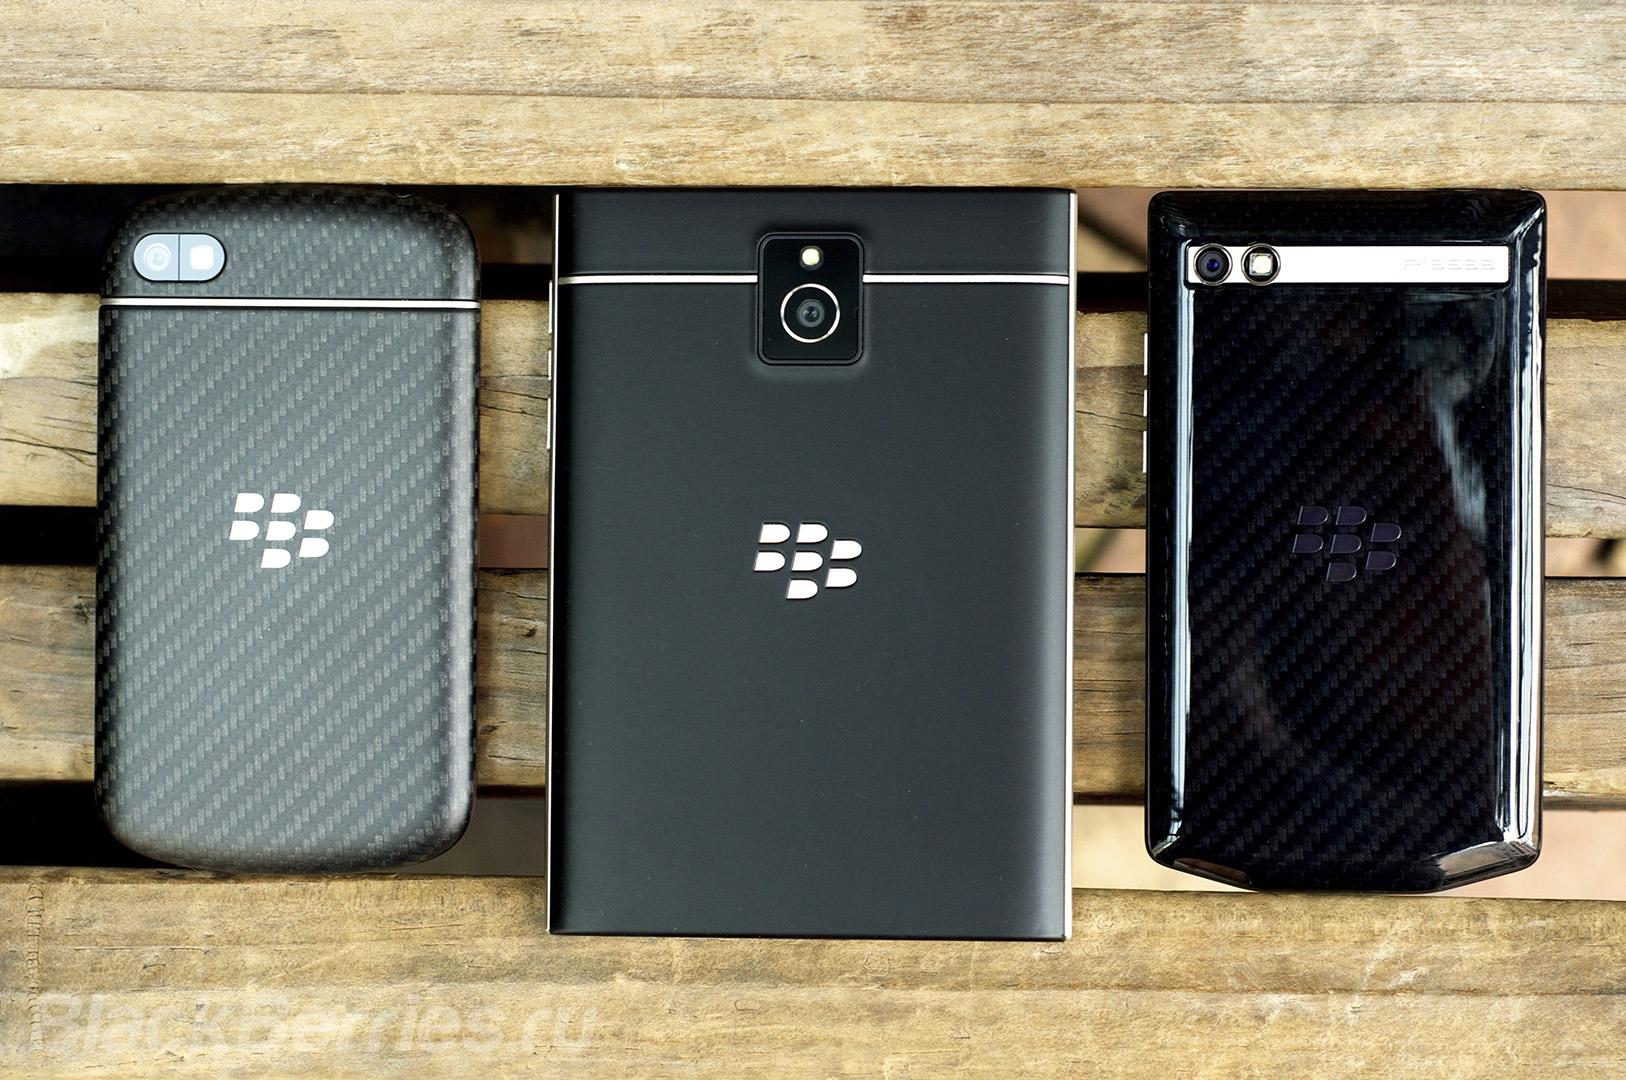 BlackBerry-Passport-Review-2014-17